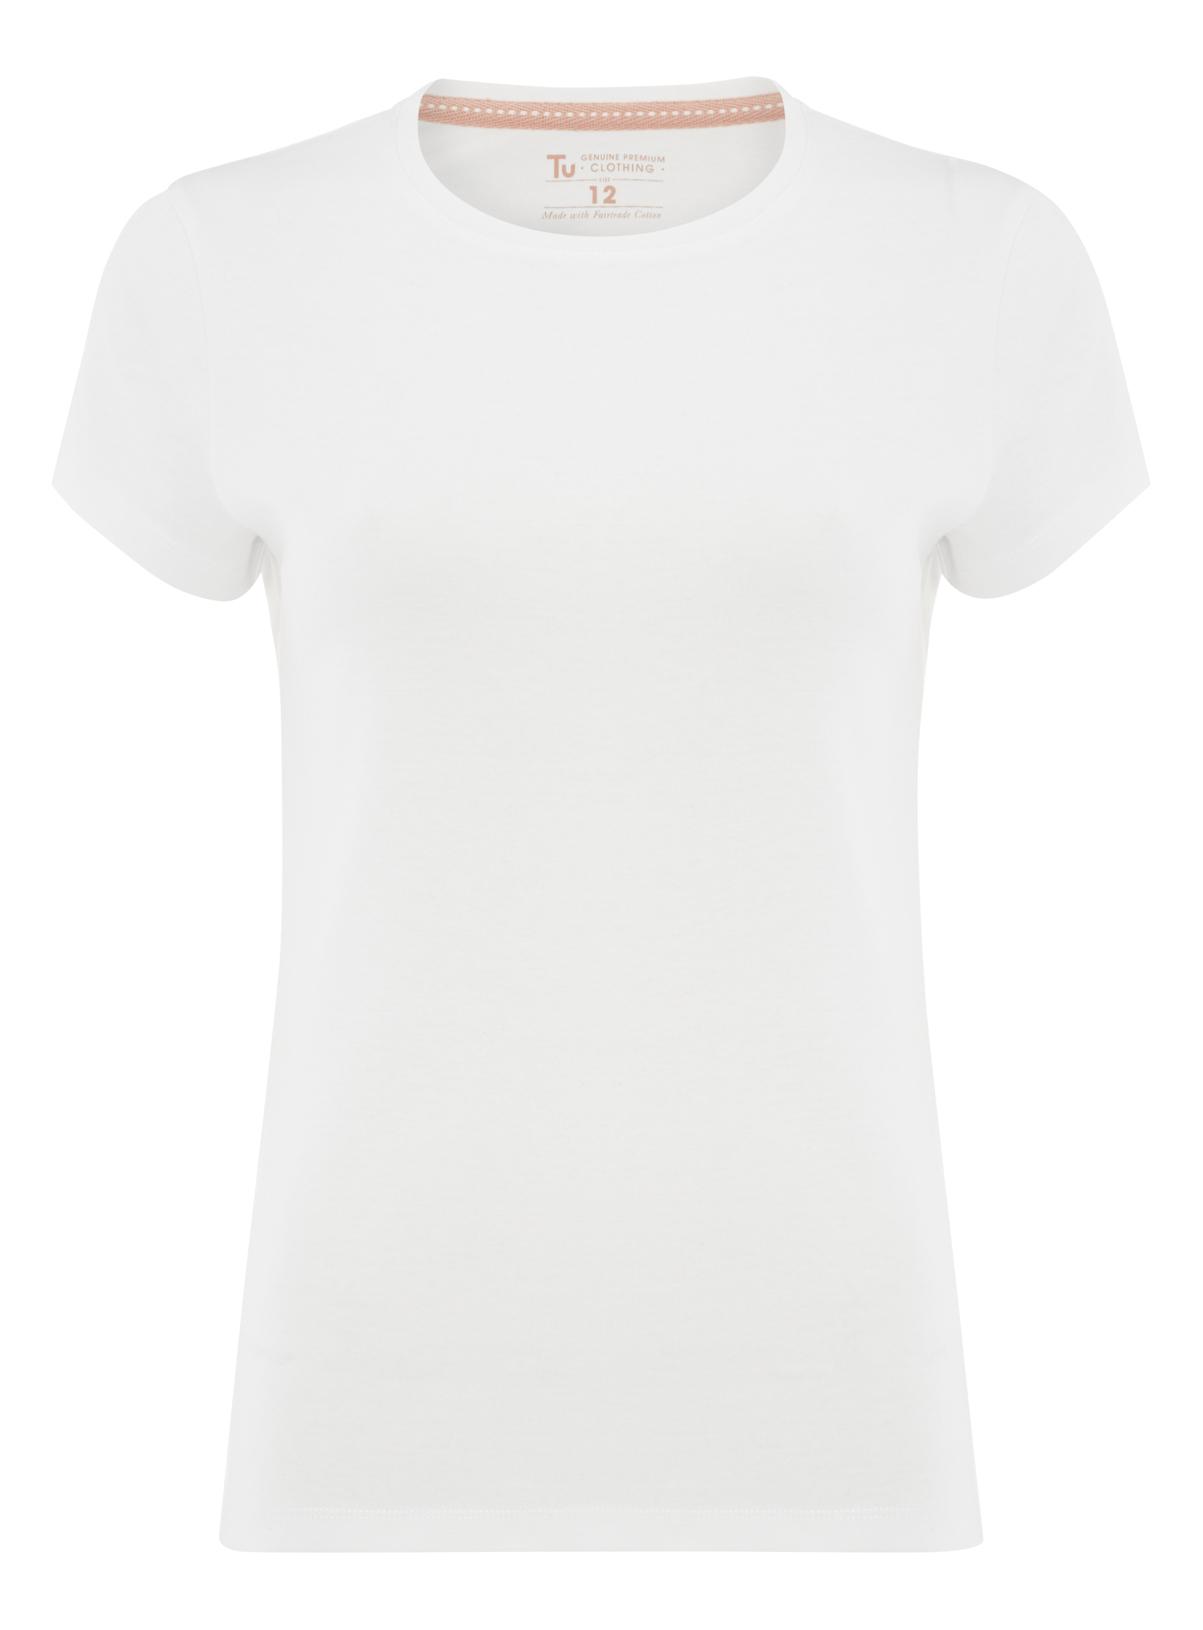 Womens White Plain Crew Neck T-Shirt | Tu clothing